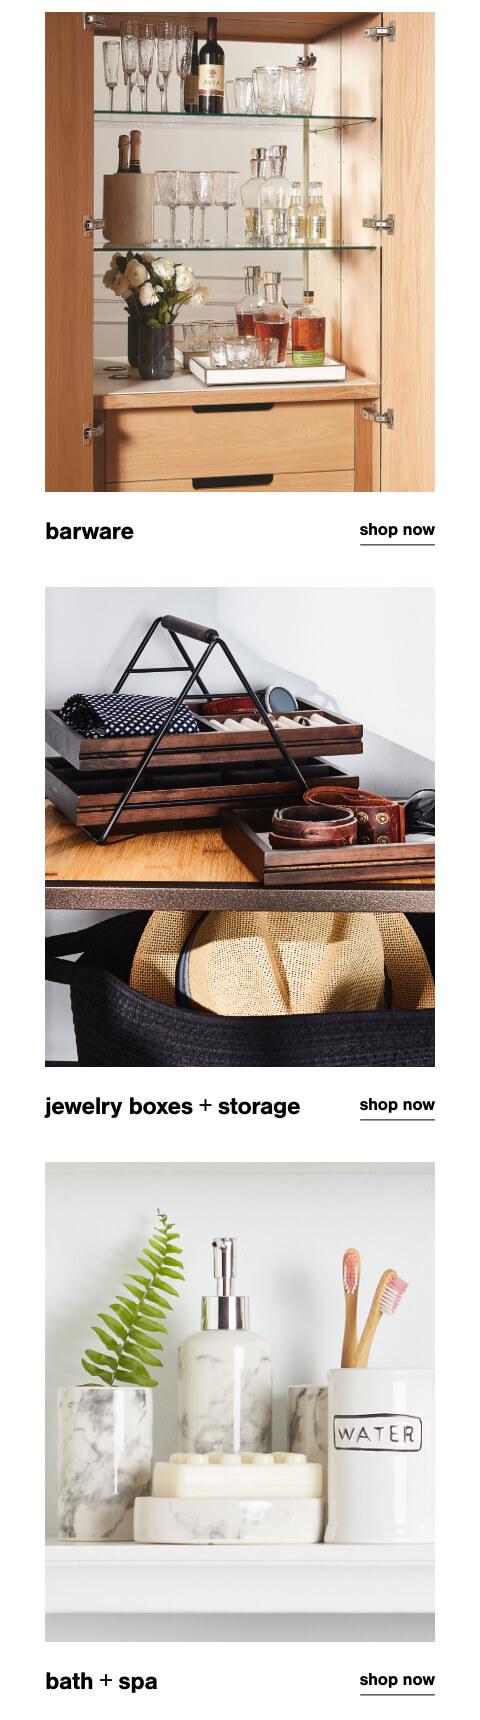 Barware, Jewelry Boxes & Storage, Bath & Spa